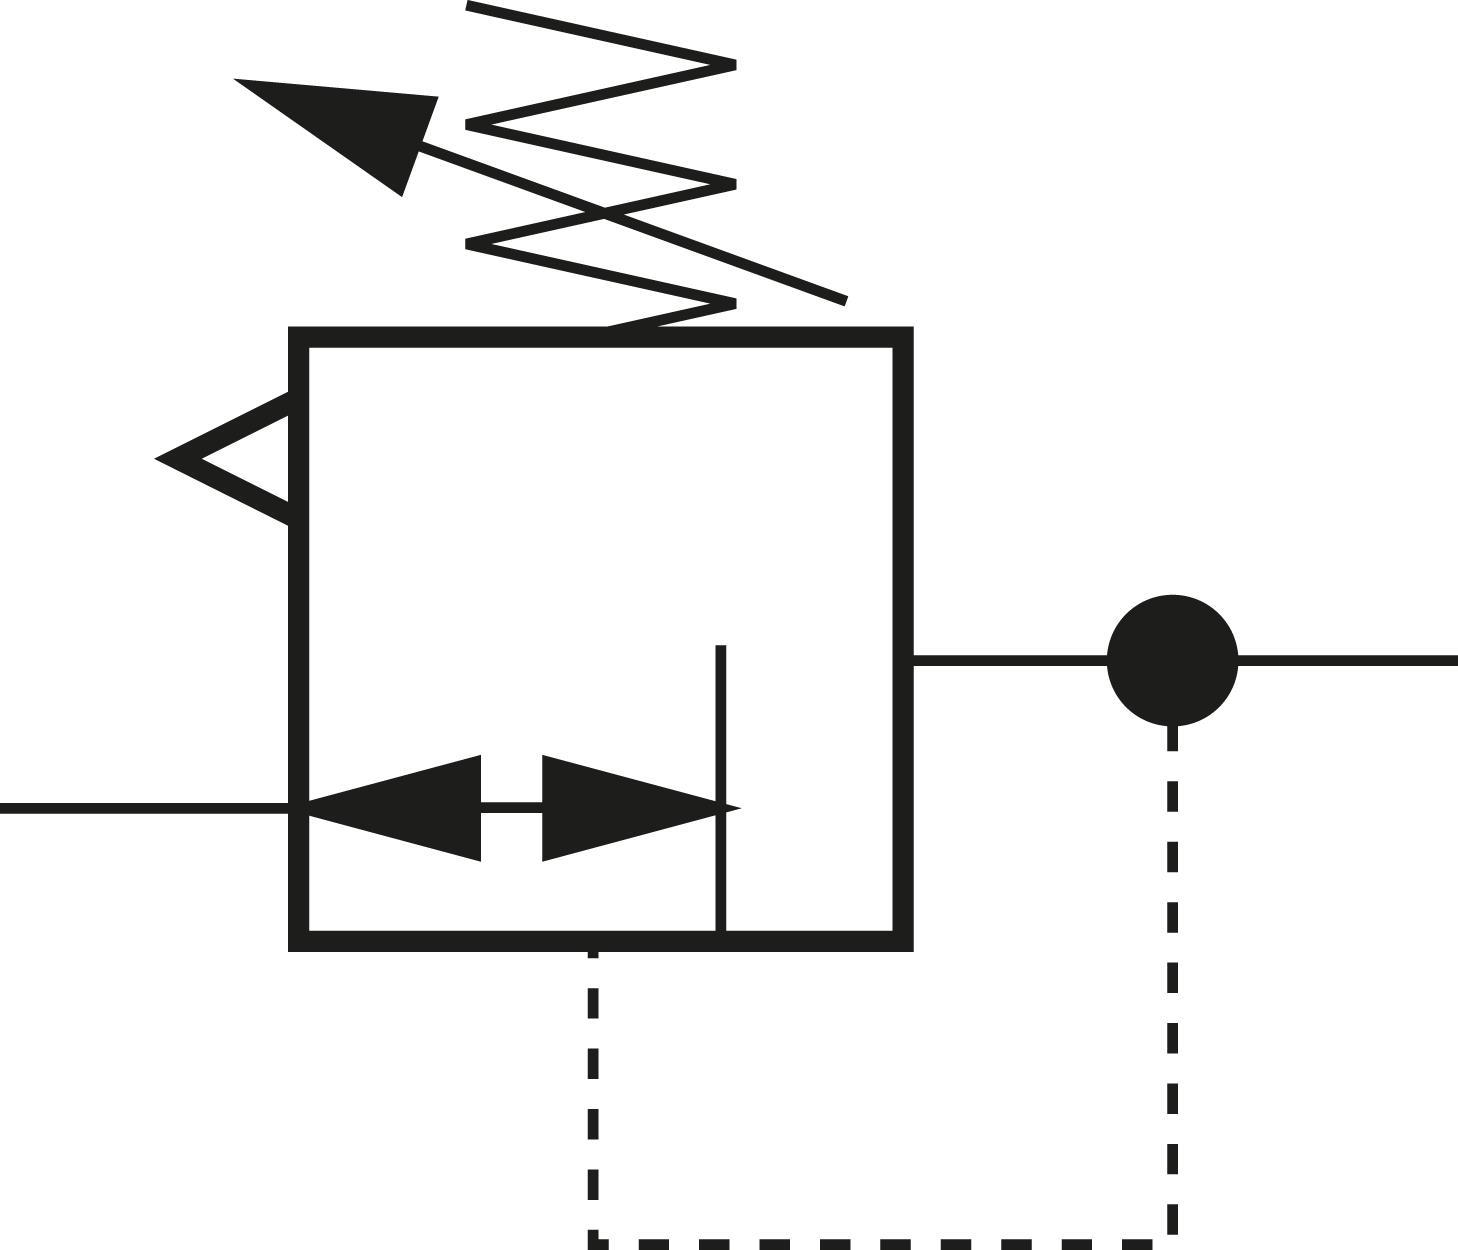 Symbole de commutation